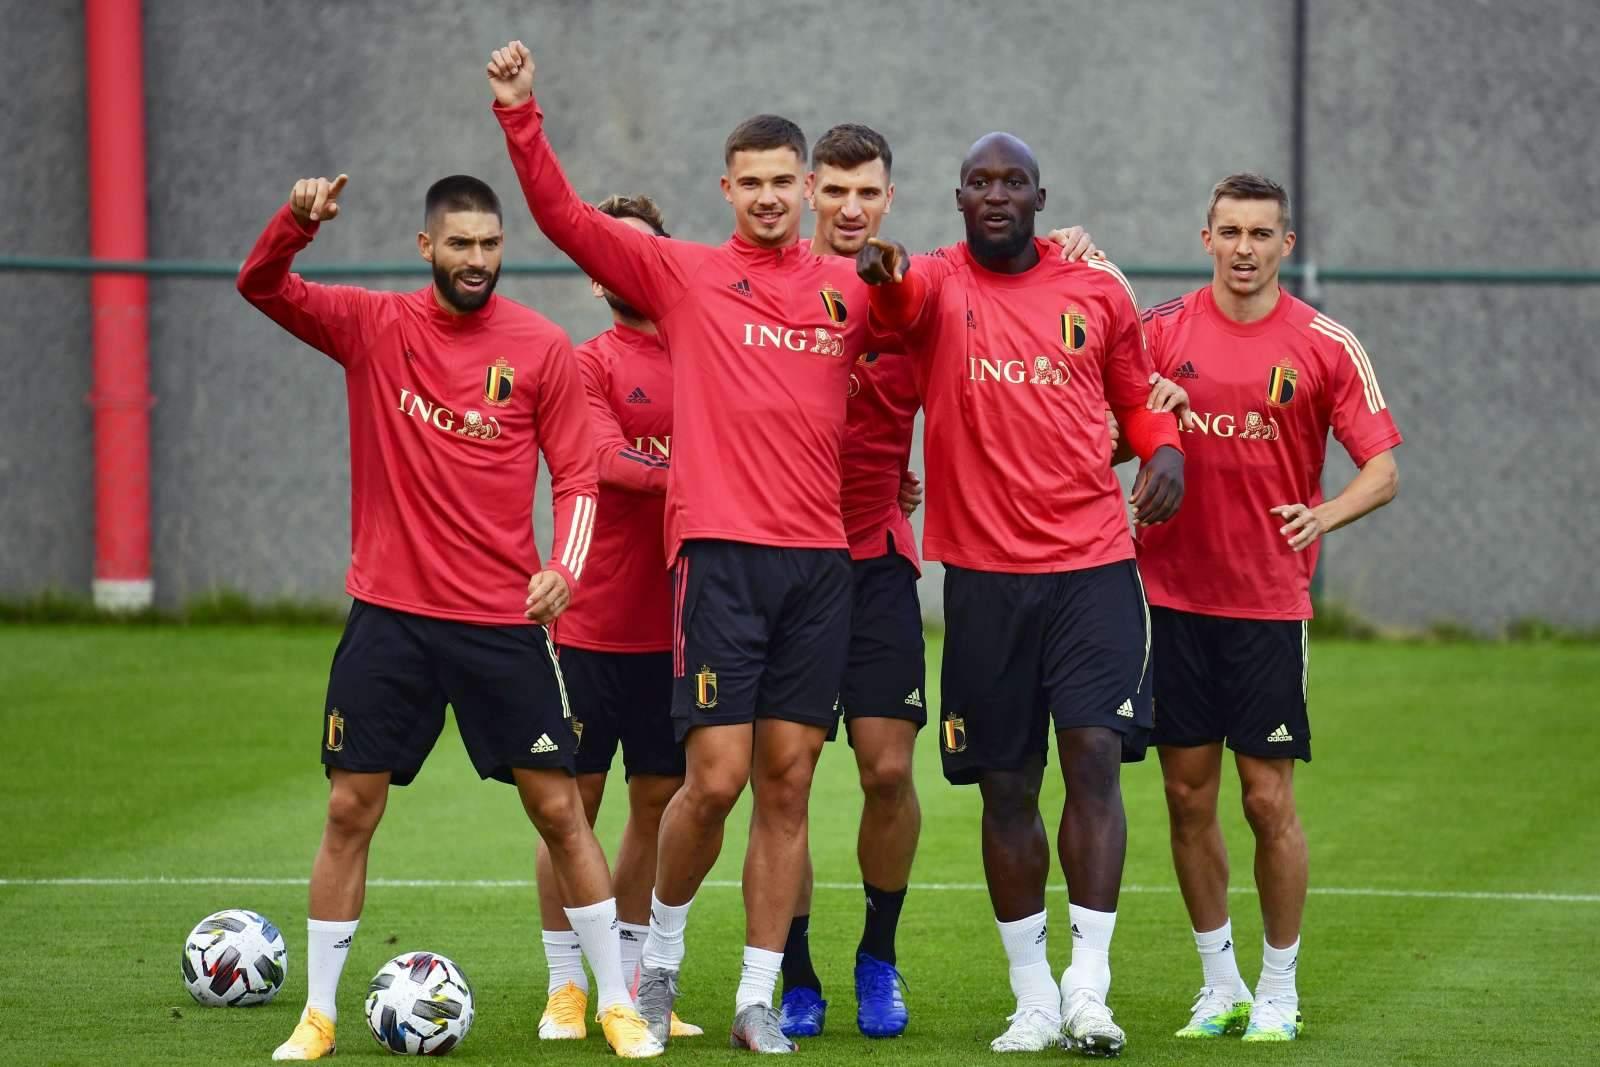 Бельгия - Греция - 1:1 (закончен)